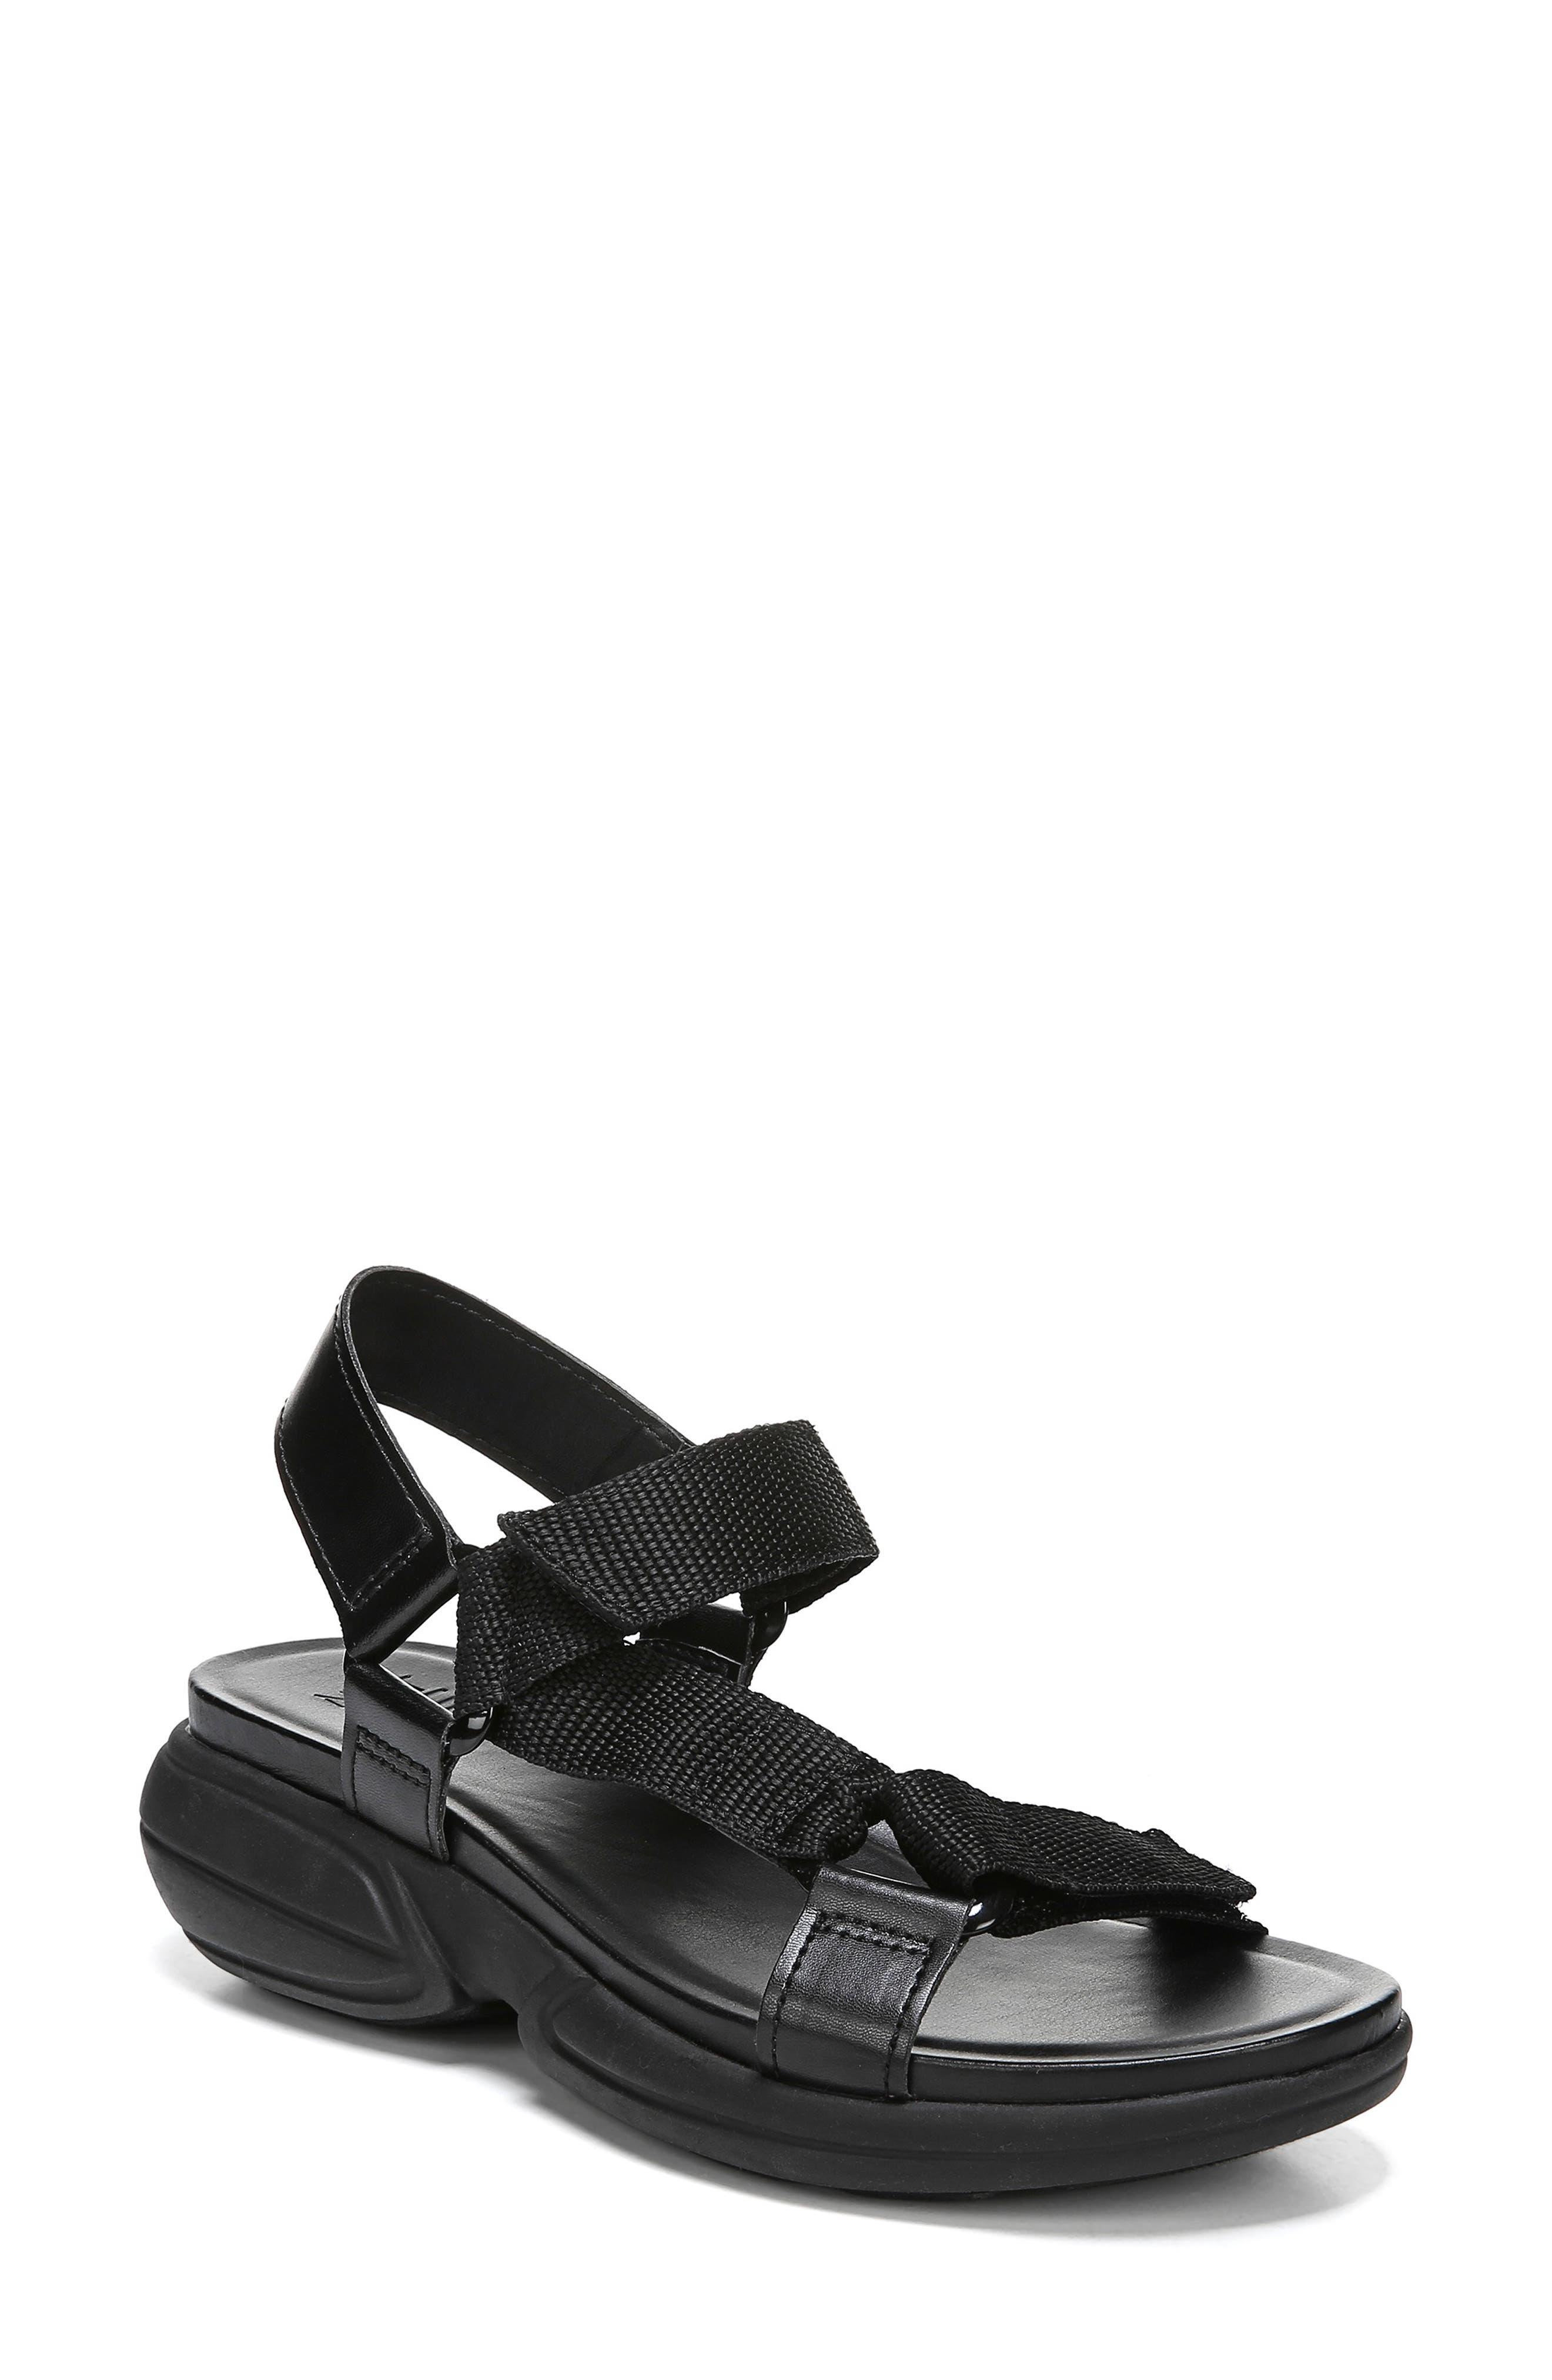 2c33d4cbf30e92 Women s Naturalizer Sandals